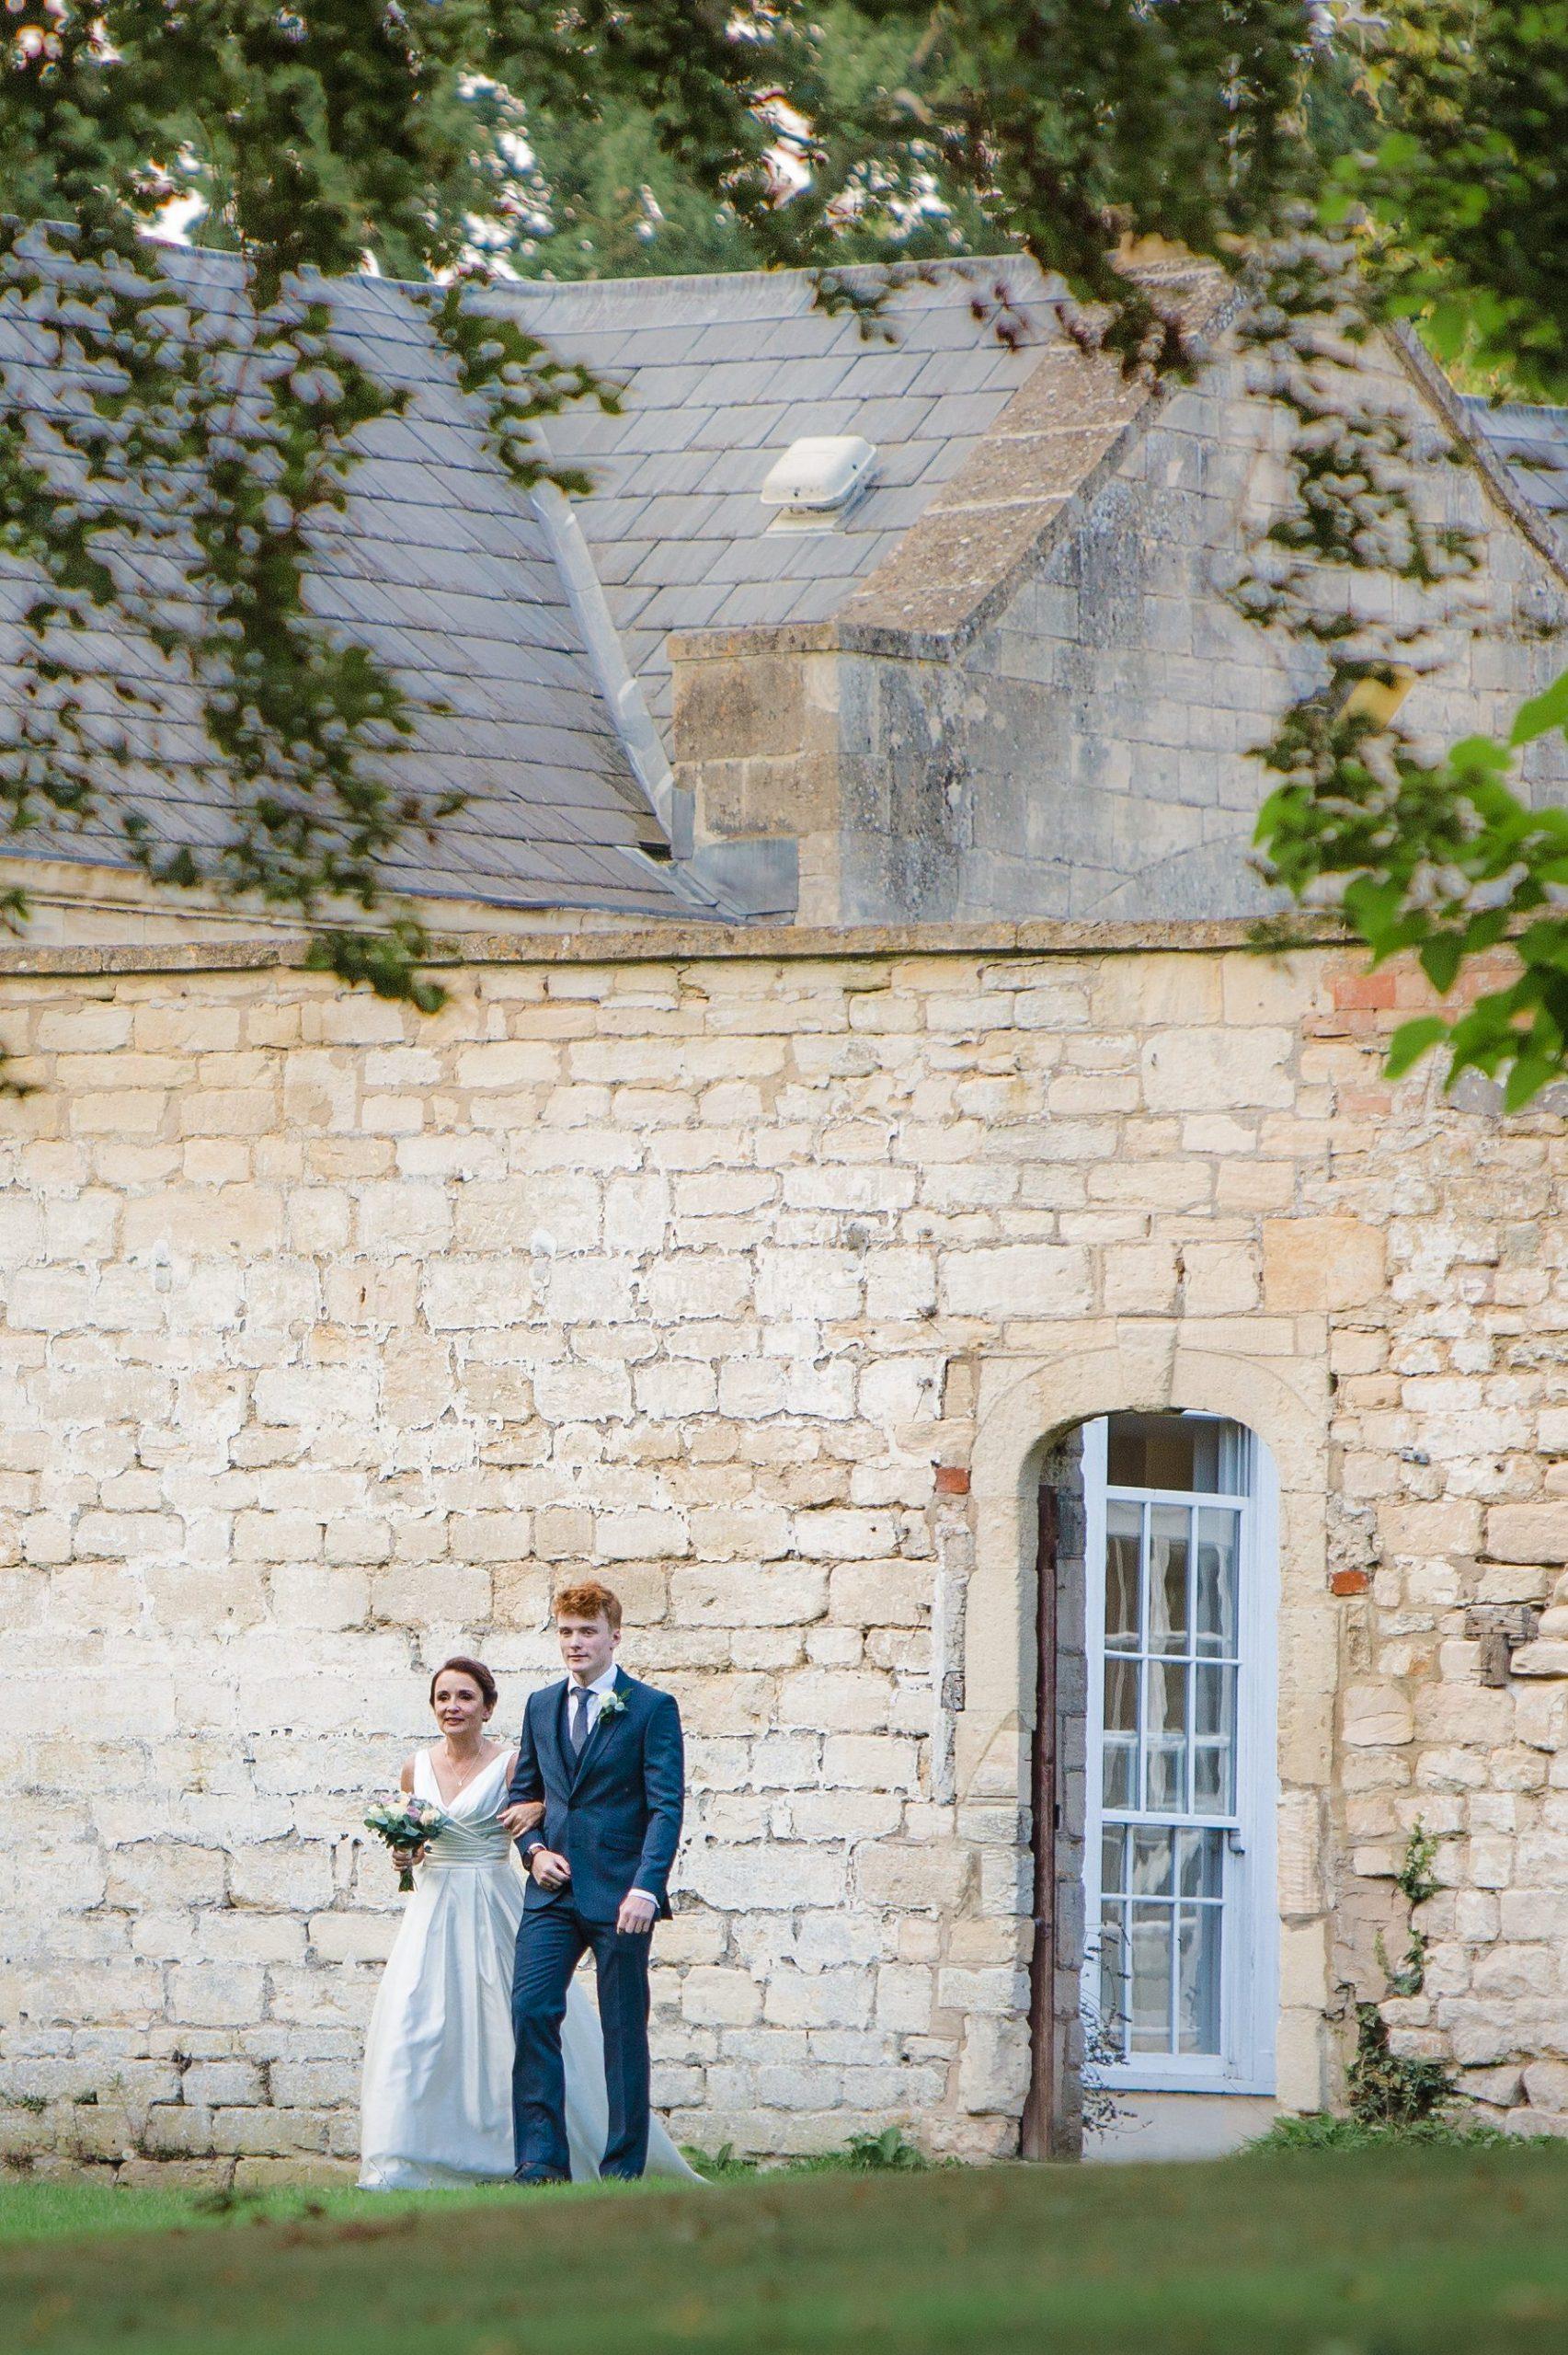 wedding photographer wedding eastington park orangery wall